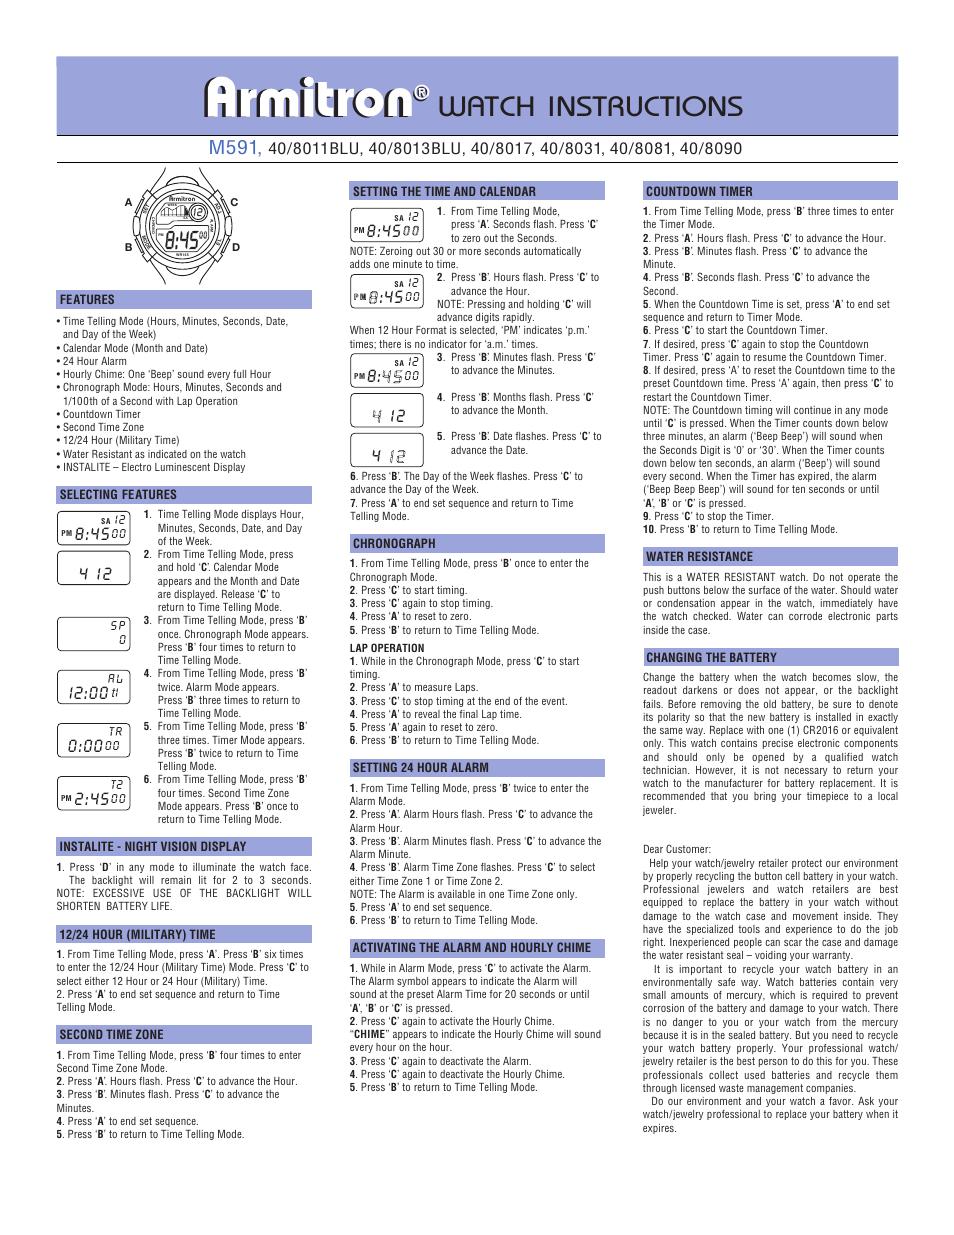 Armitrongentsdigital2.pdf, Armitron, Tron   Armitron 40/8095SIL User Manual   Page 2 / 2